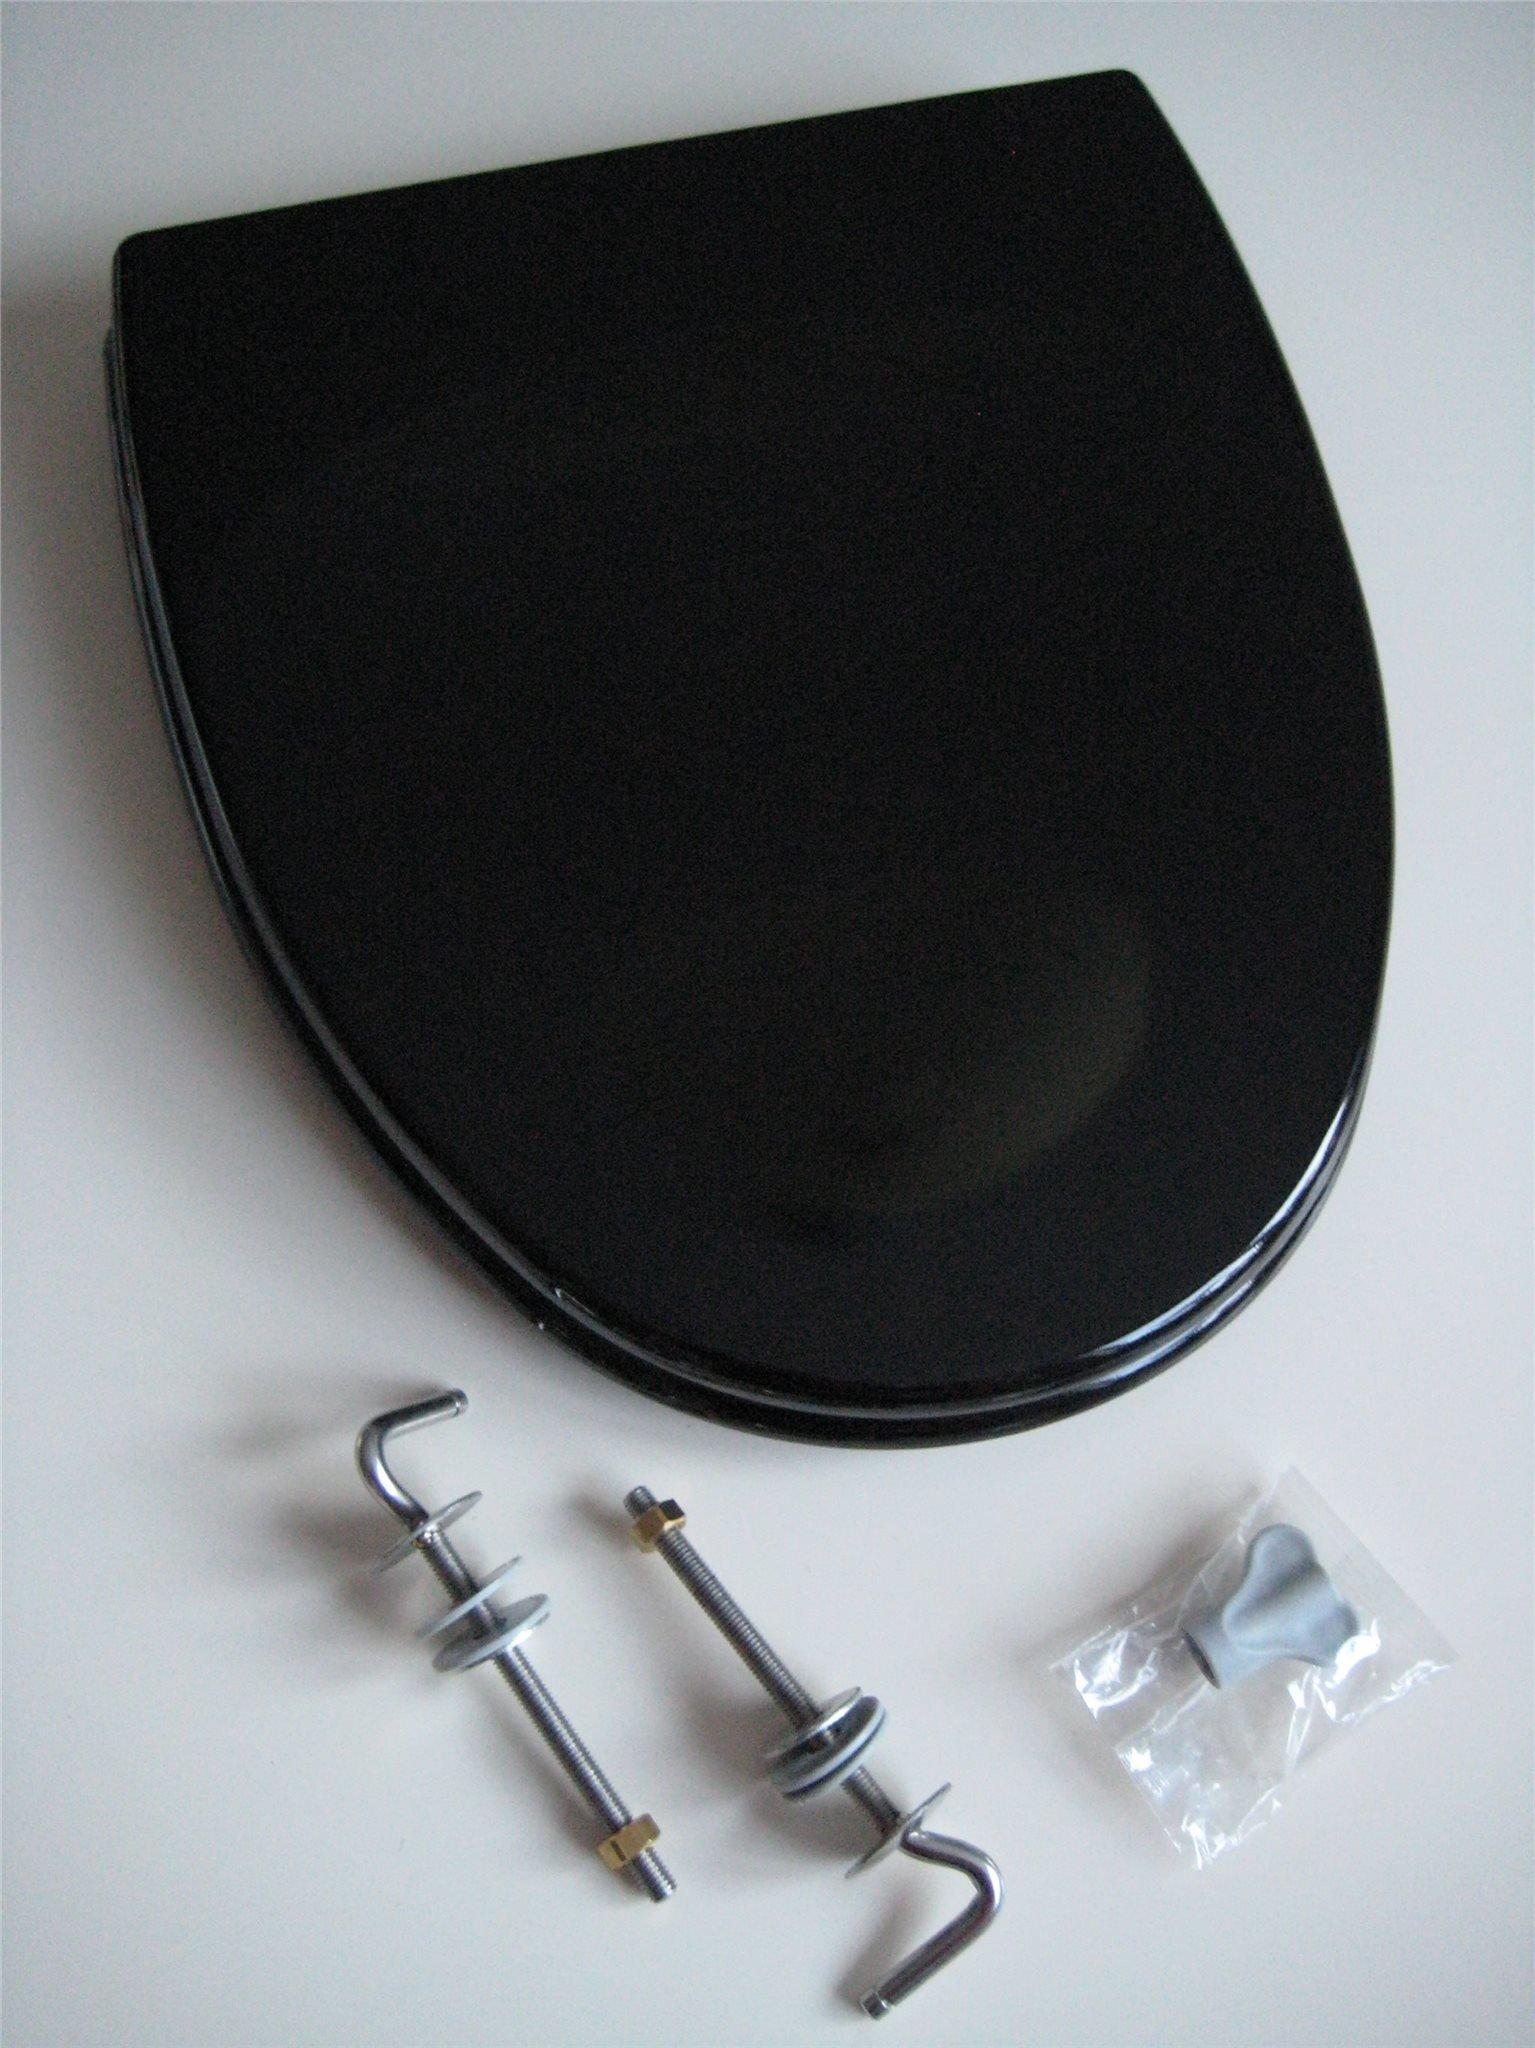 Nya Svart toalettsits / toalettlock till IFÖ CERA -.. (364542912) ᐈ RP-08